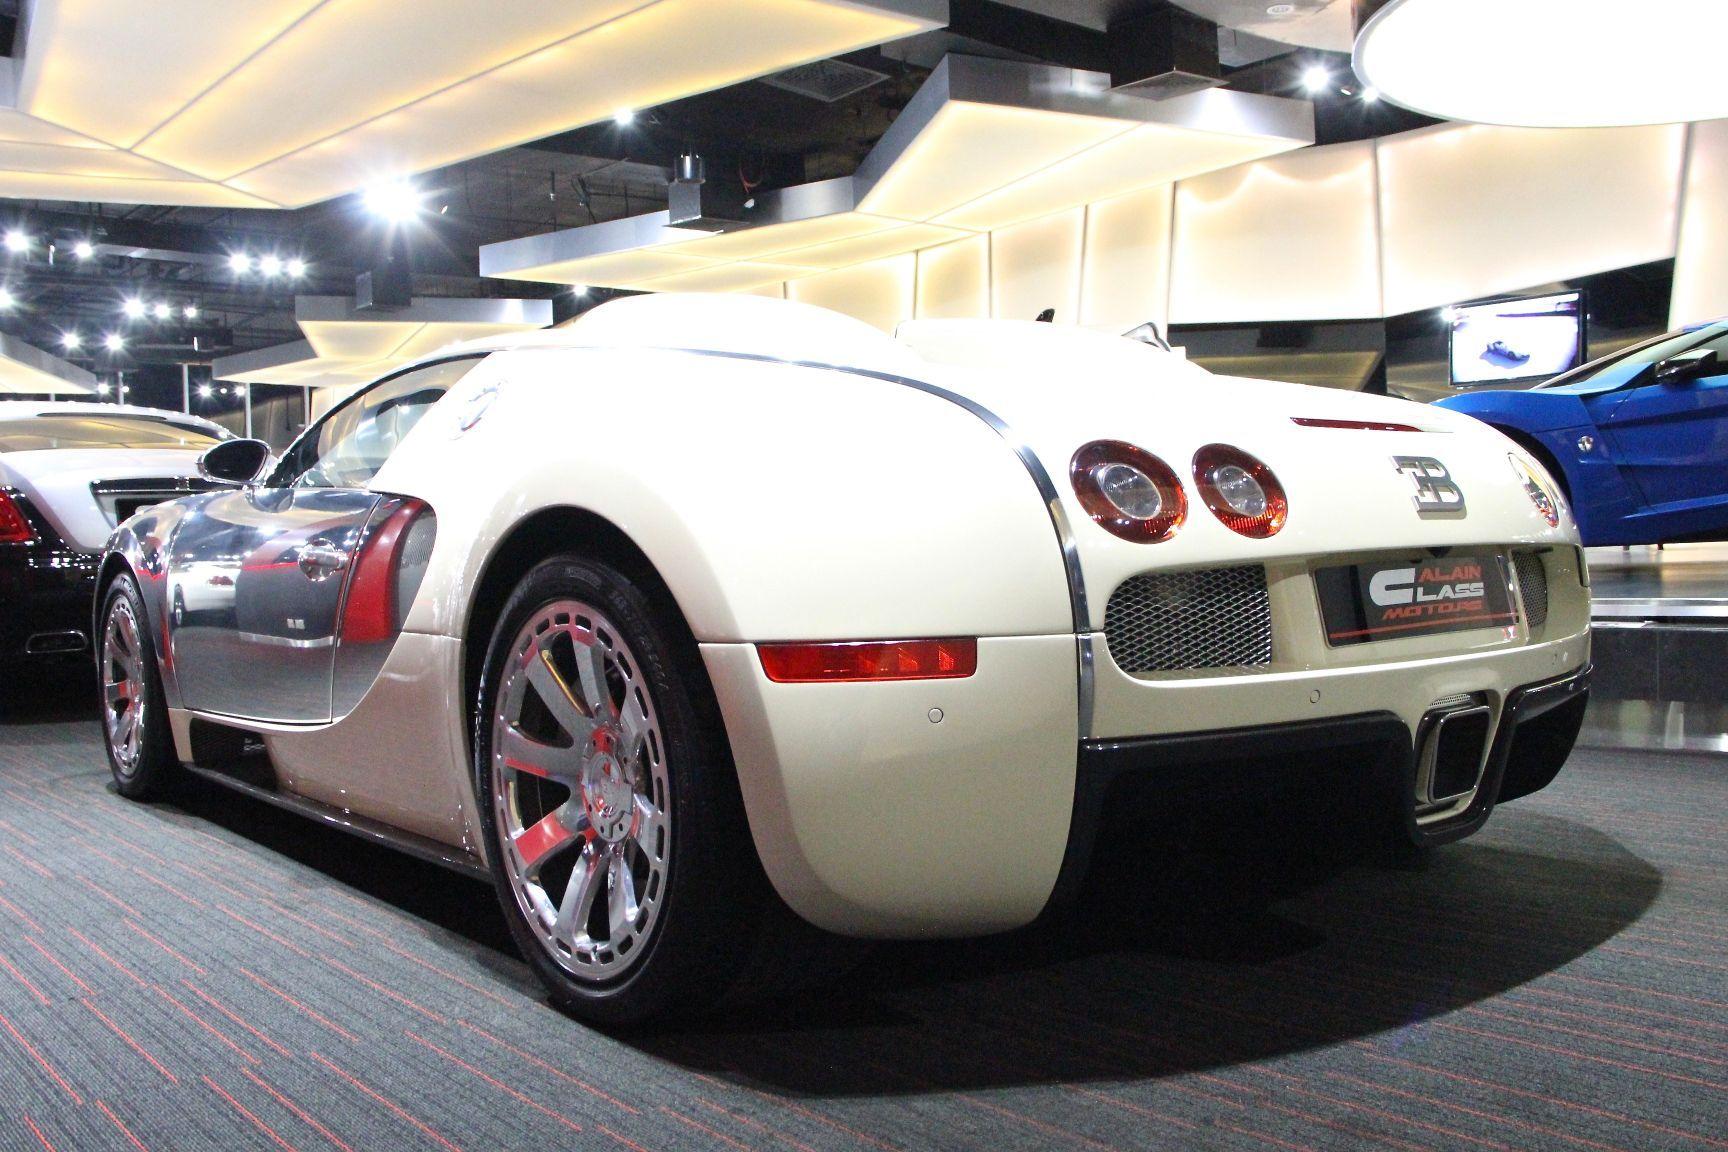 bugatti veyron l edition centenaire s for sale at al ain class gtspirit. Black Bedroom Furniture Sets. Home Design Ideas